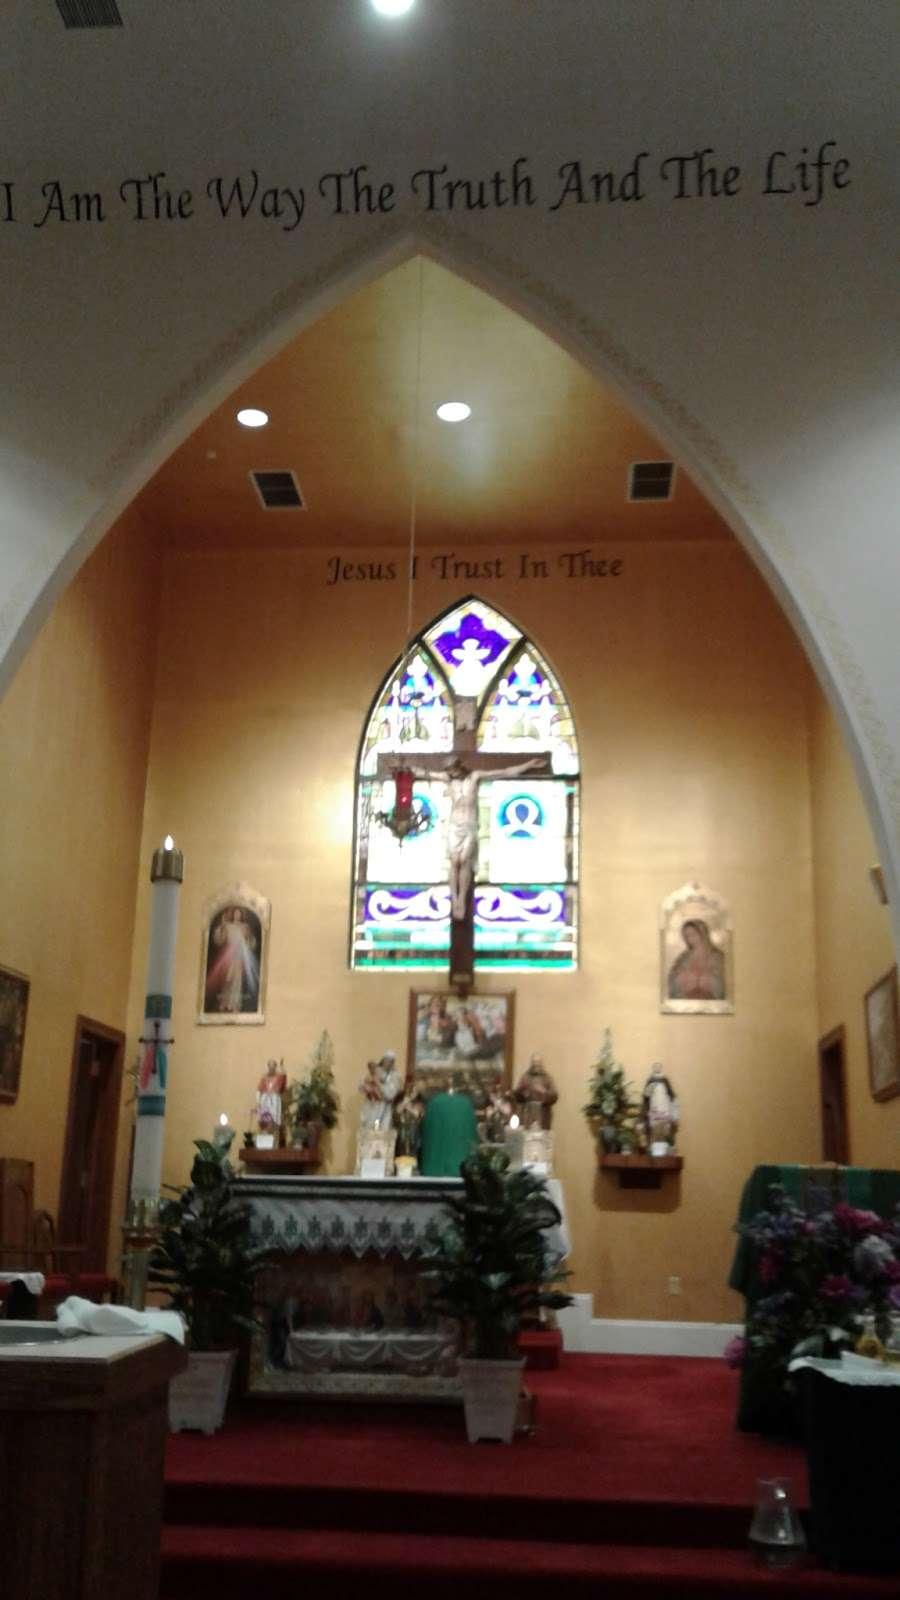 Our Lady of Victories - church  | Photo 3 of 4 | Address: 150 Harriot Ave, Harrington Park, NJ 07640, USA | Phone: (201) 768-1706